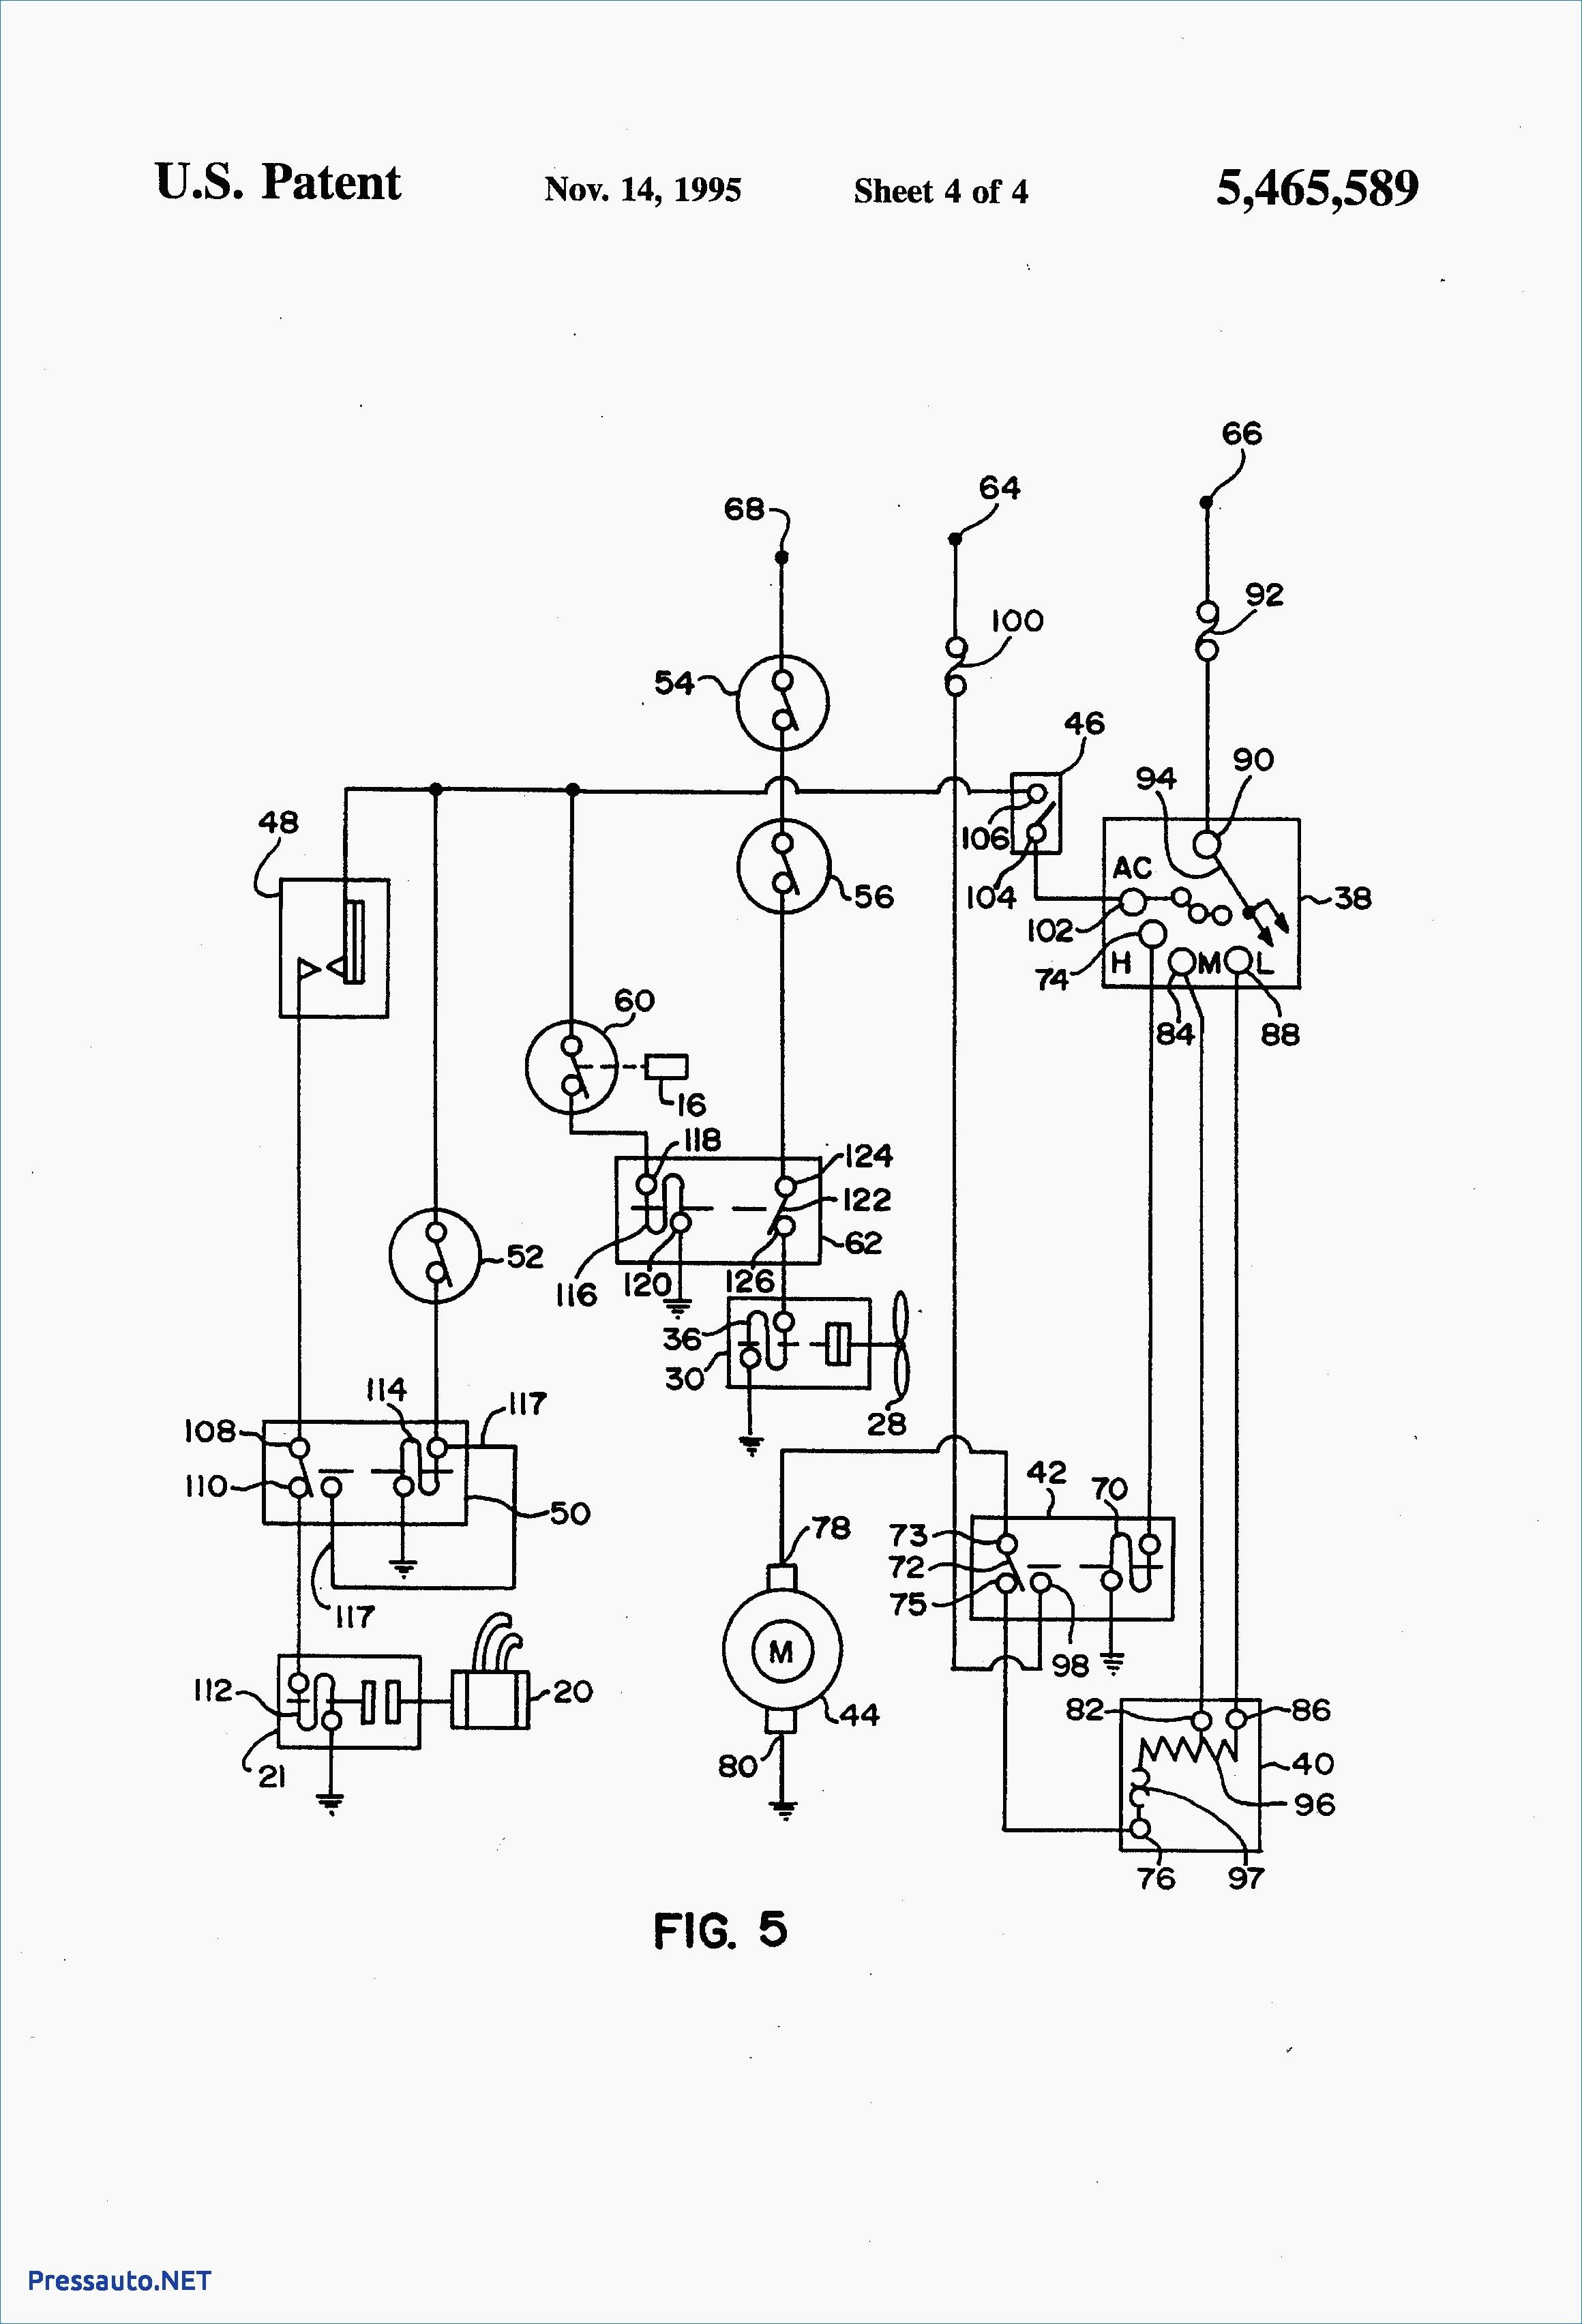 Simple Wiring Diagram For Boat Navigation Lights Fine Nav Light 1